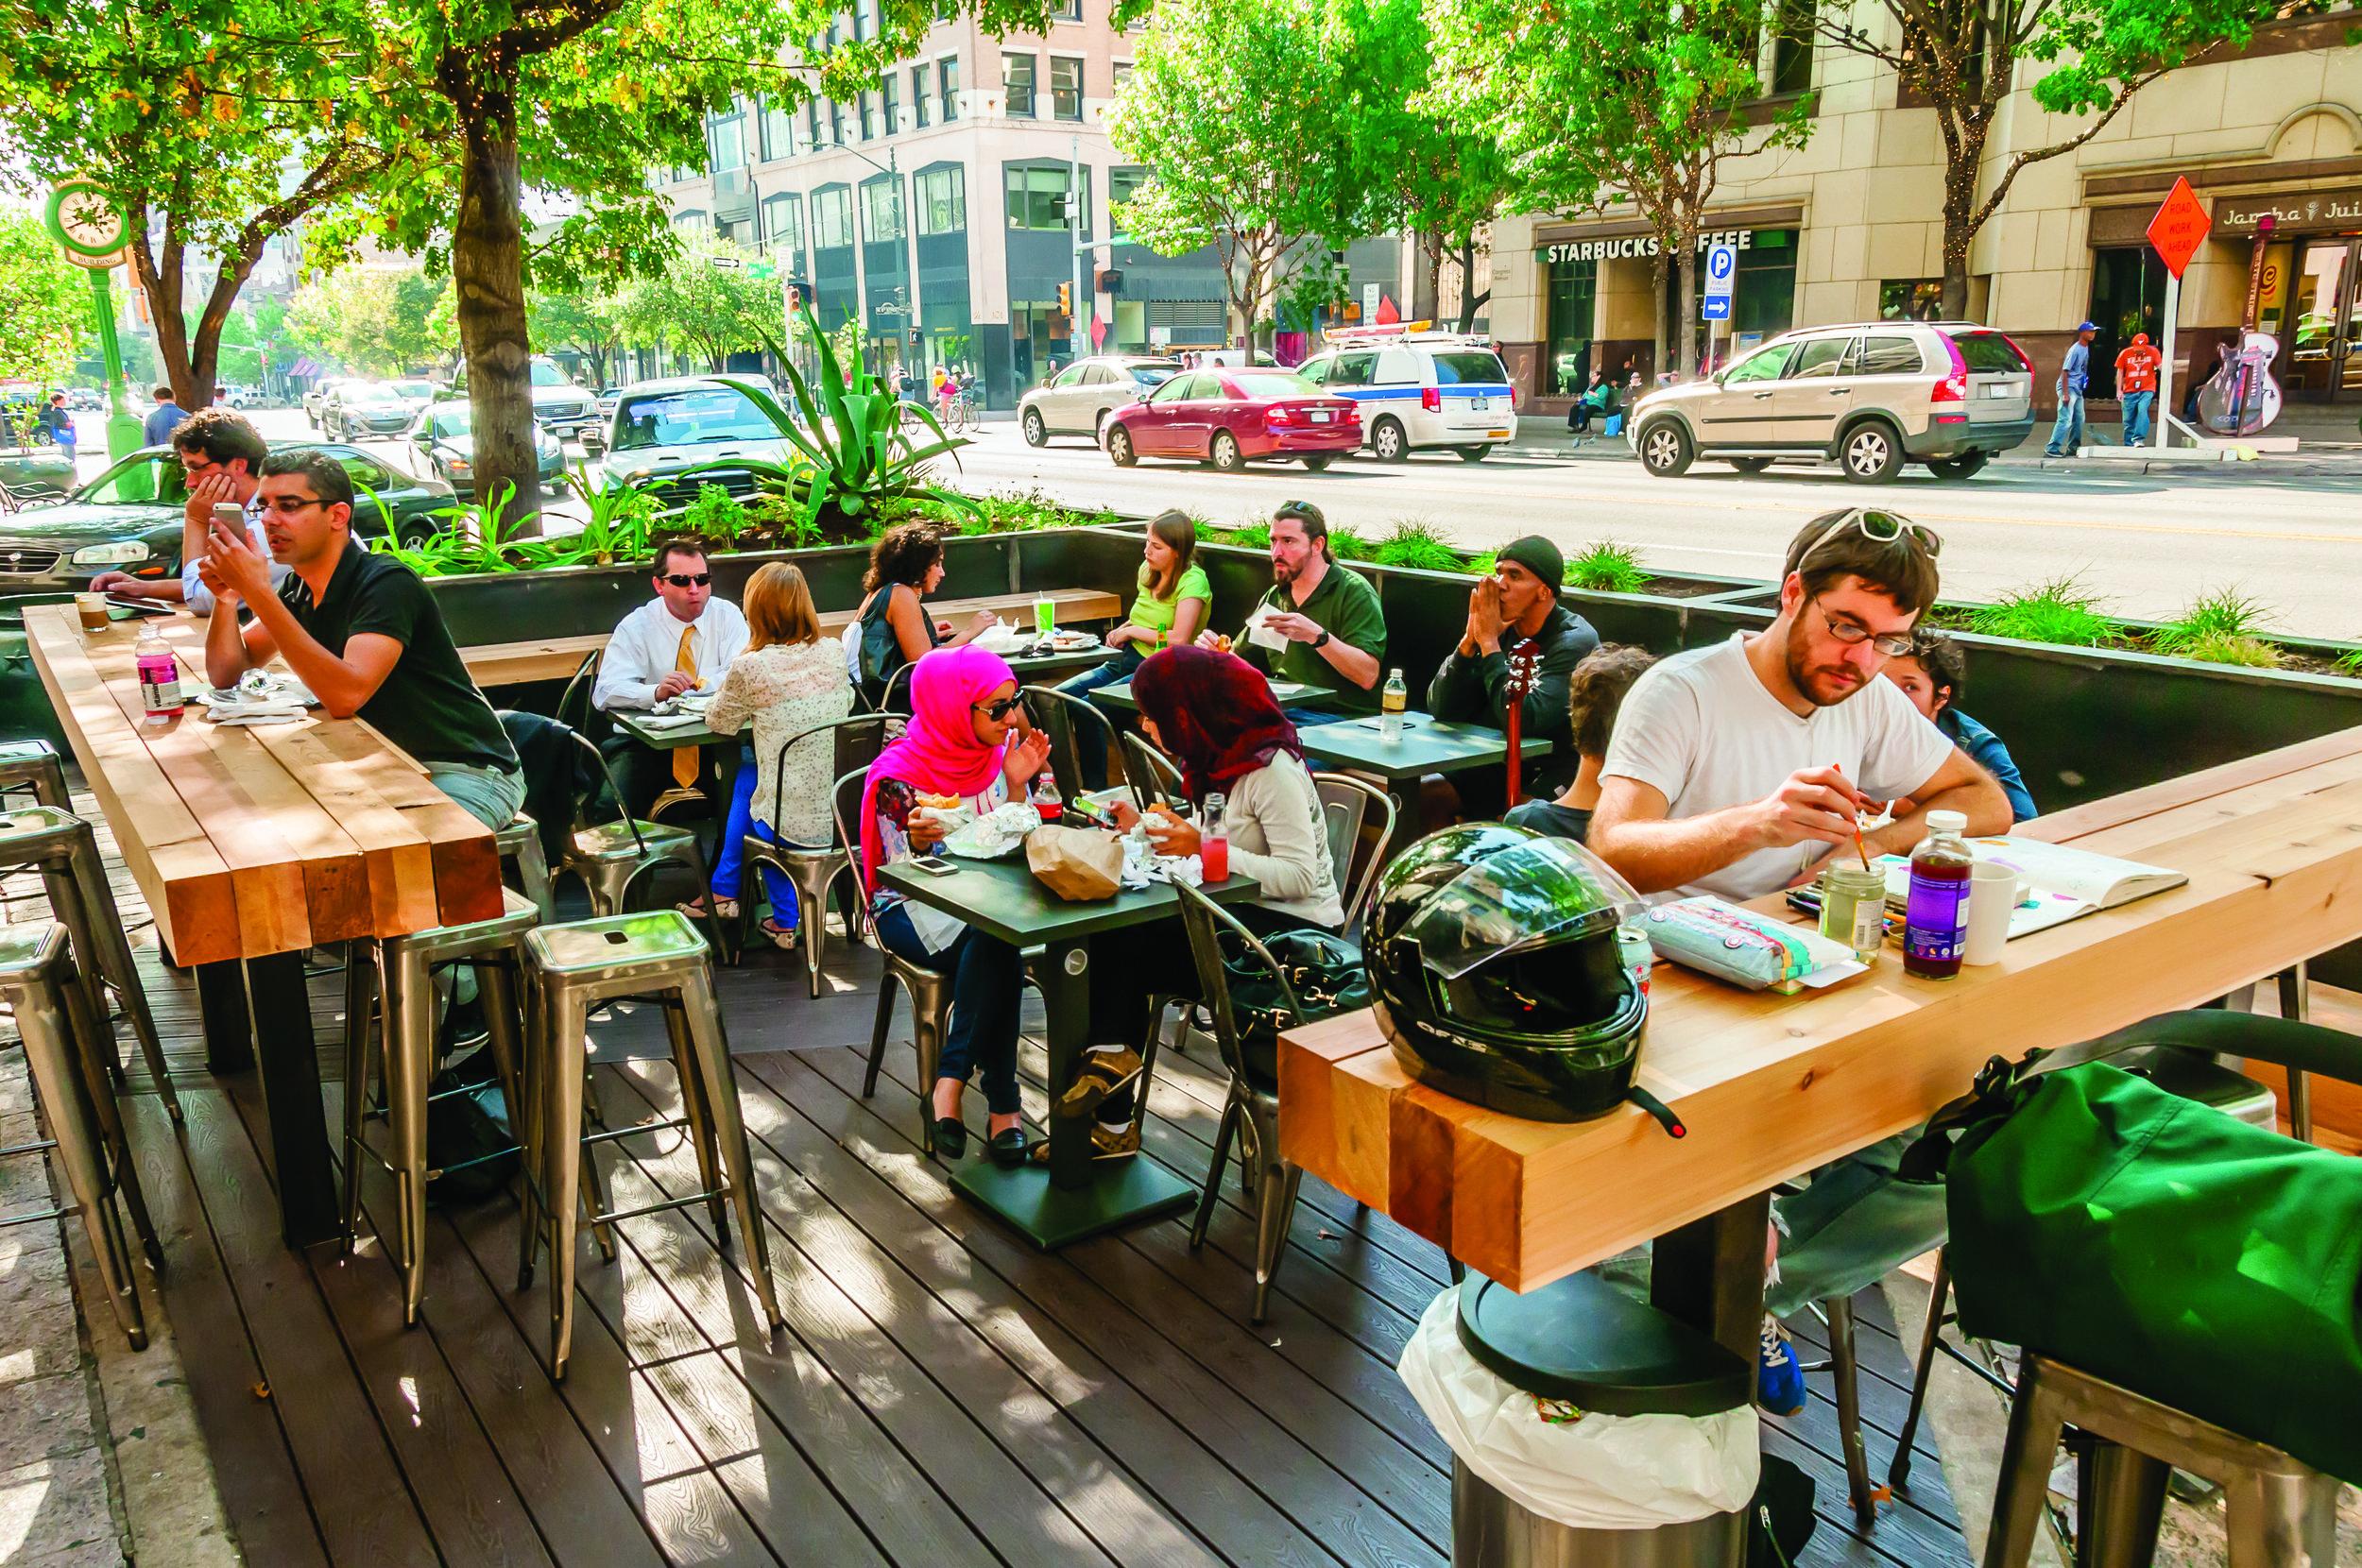 Image 4 - street cafe_downtown.jpg